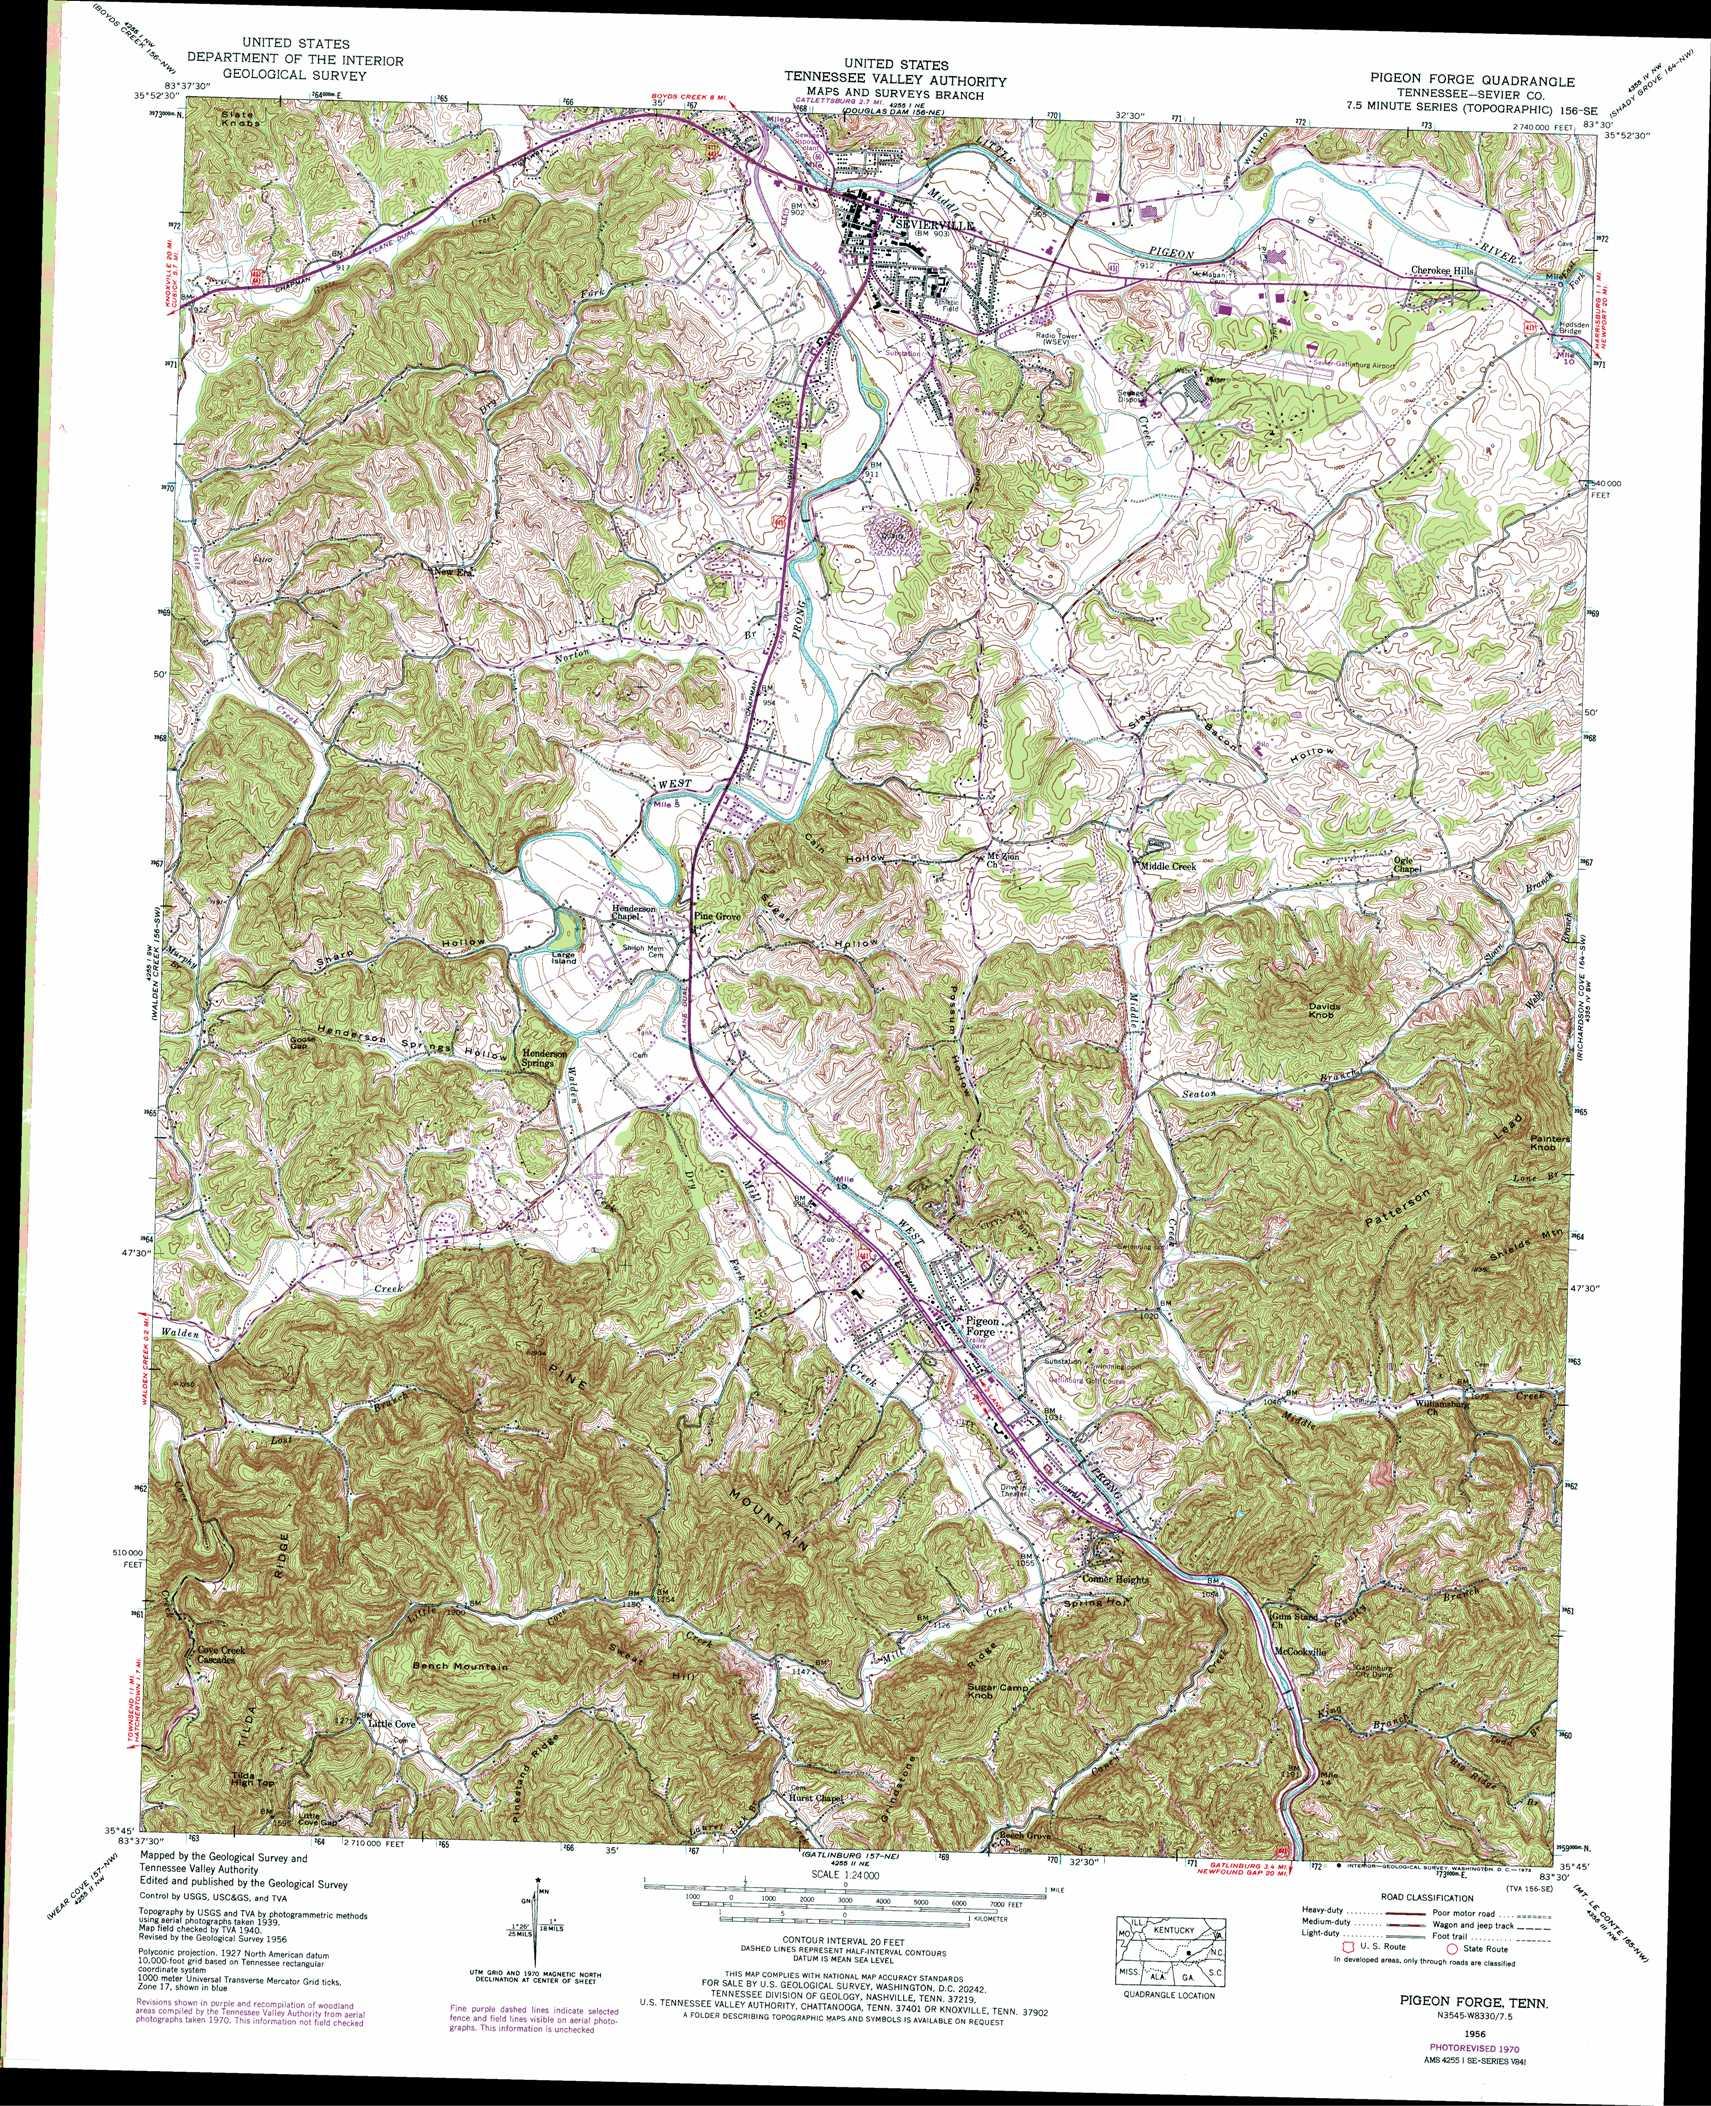 US Topo Usgs Topo Map My Blog Washington County Maps And Charts